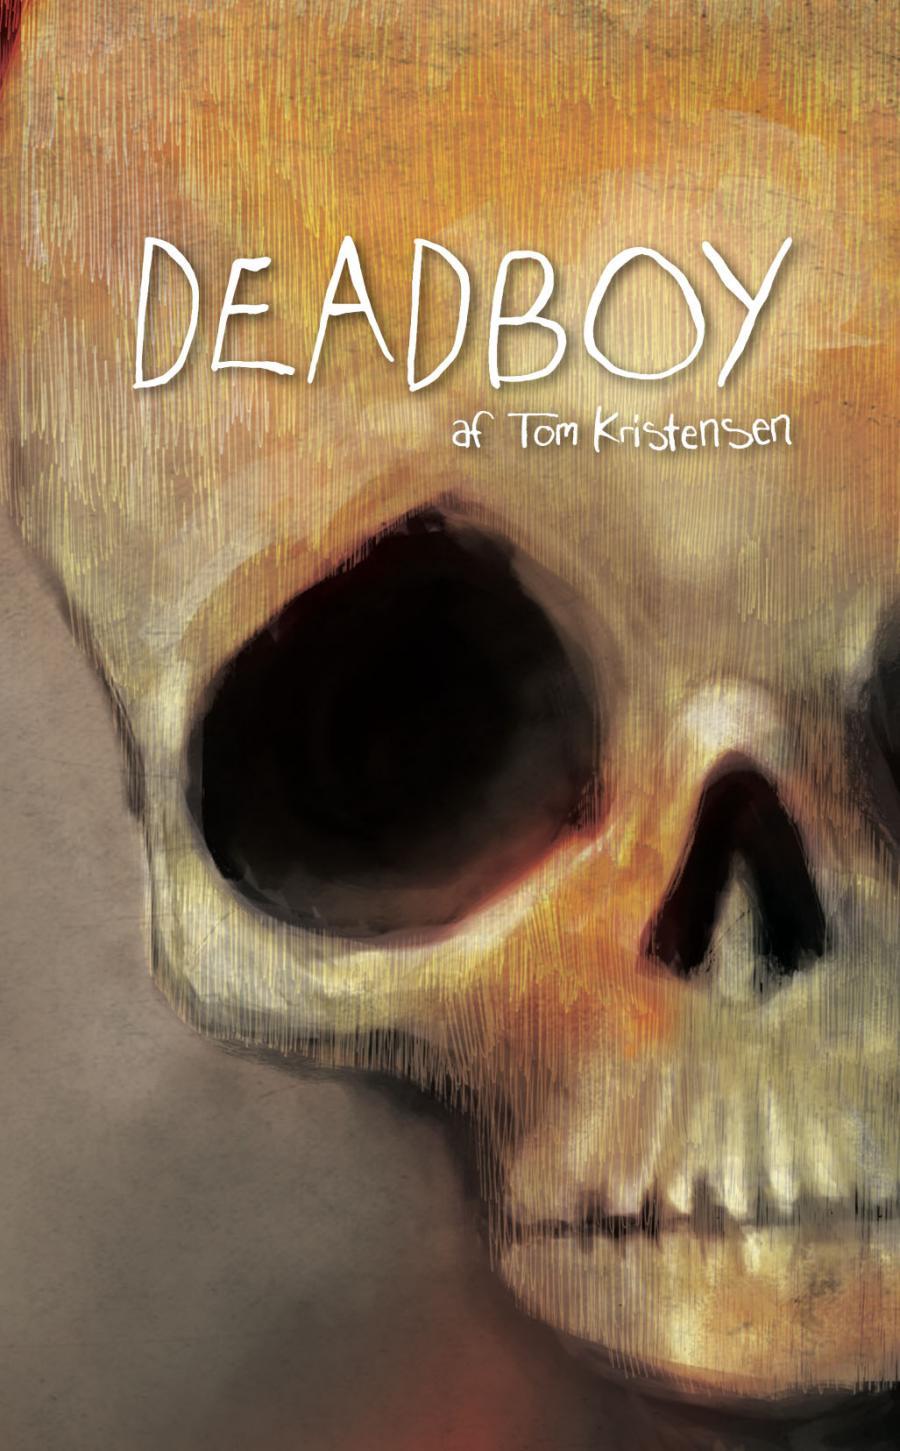 Deadboy af Tom Kristensen